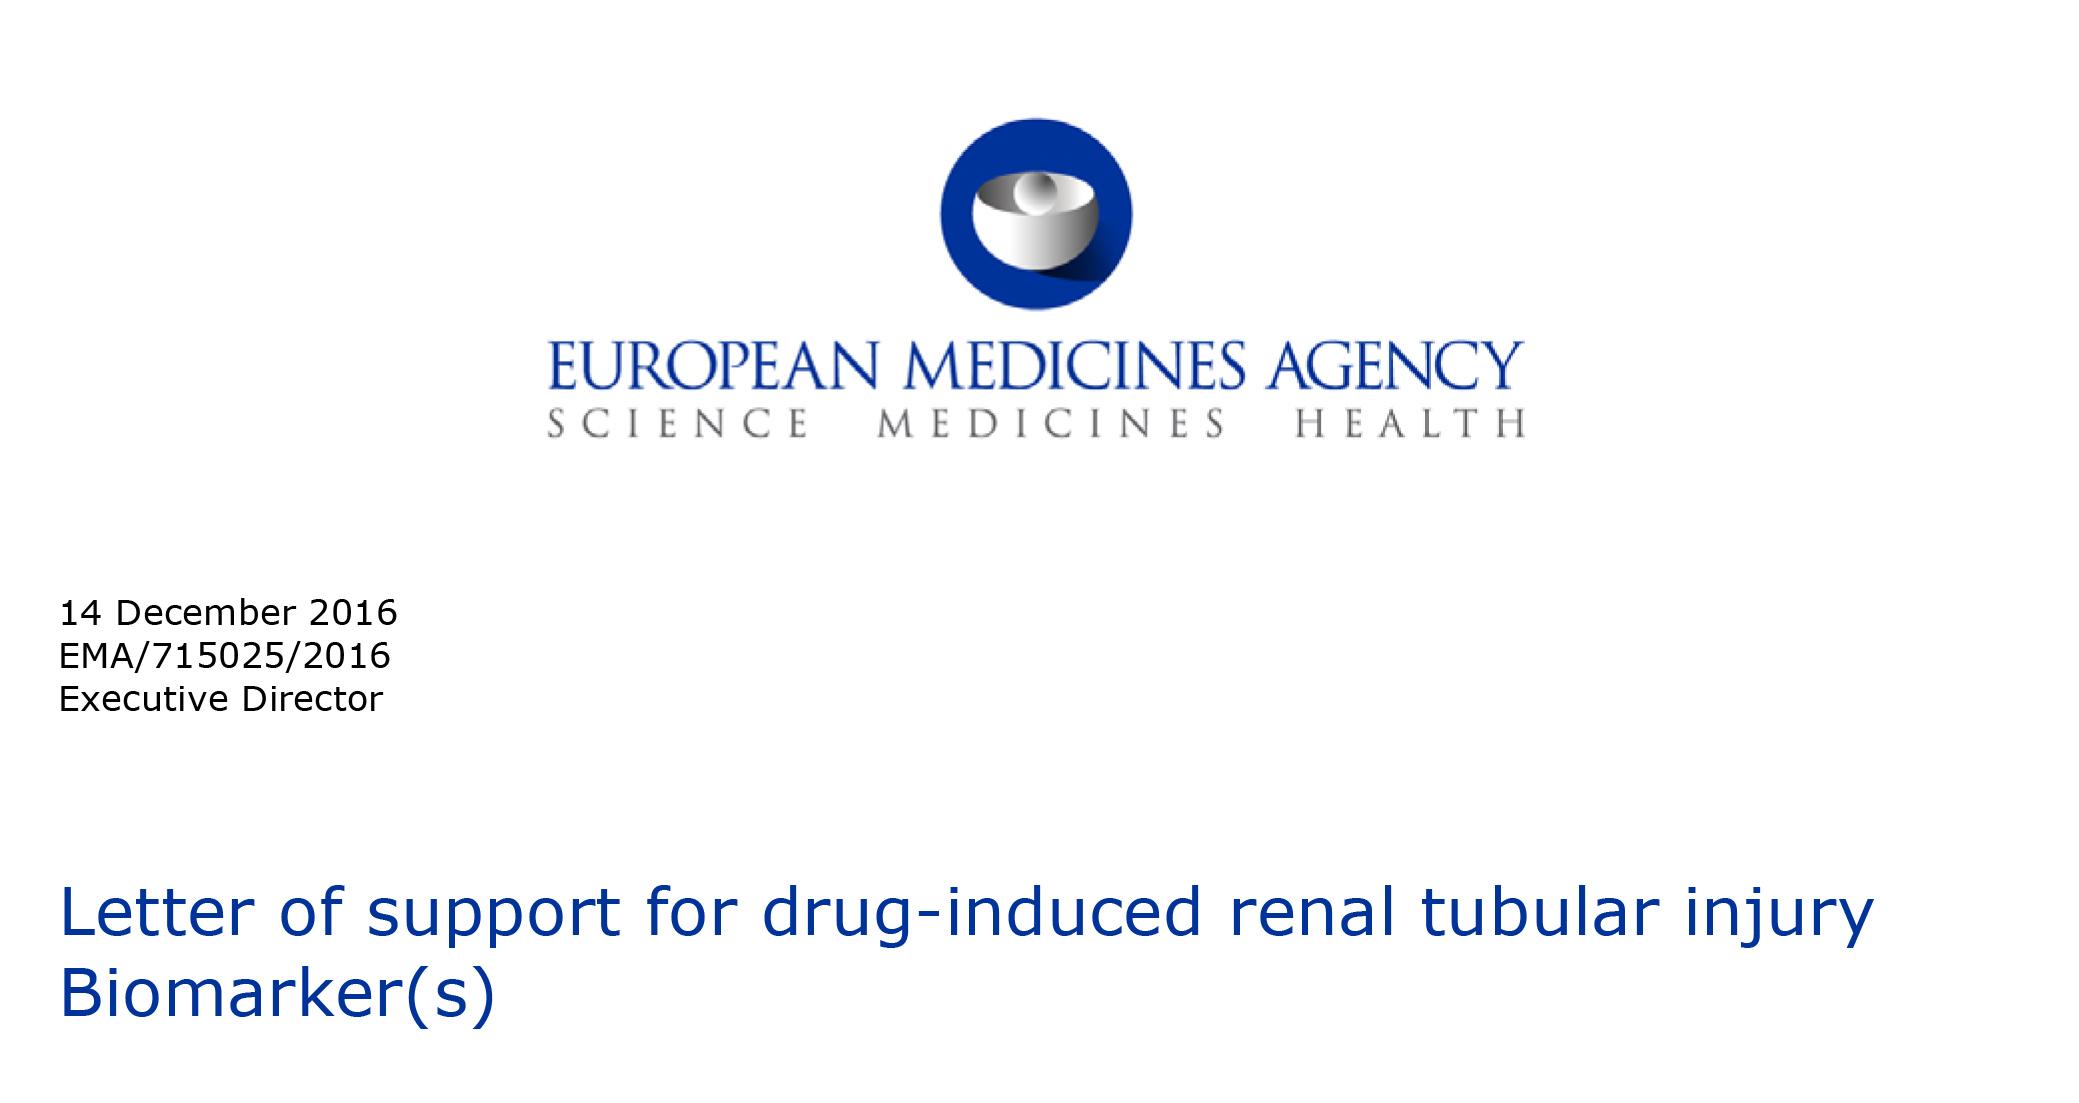 EDMA Supports Renal Injury Biomarkers